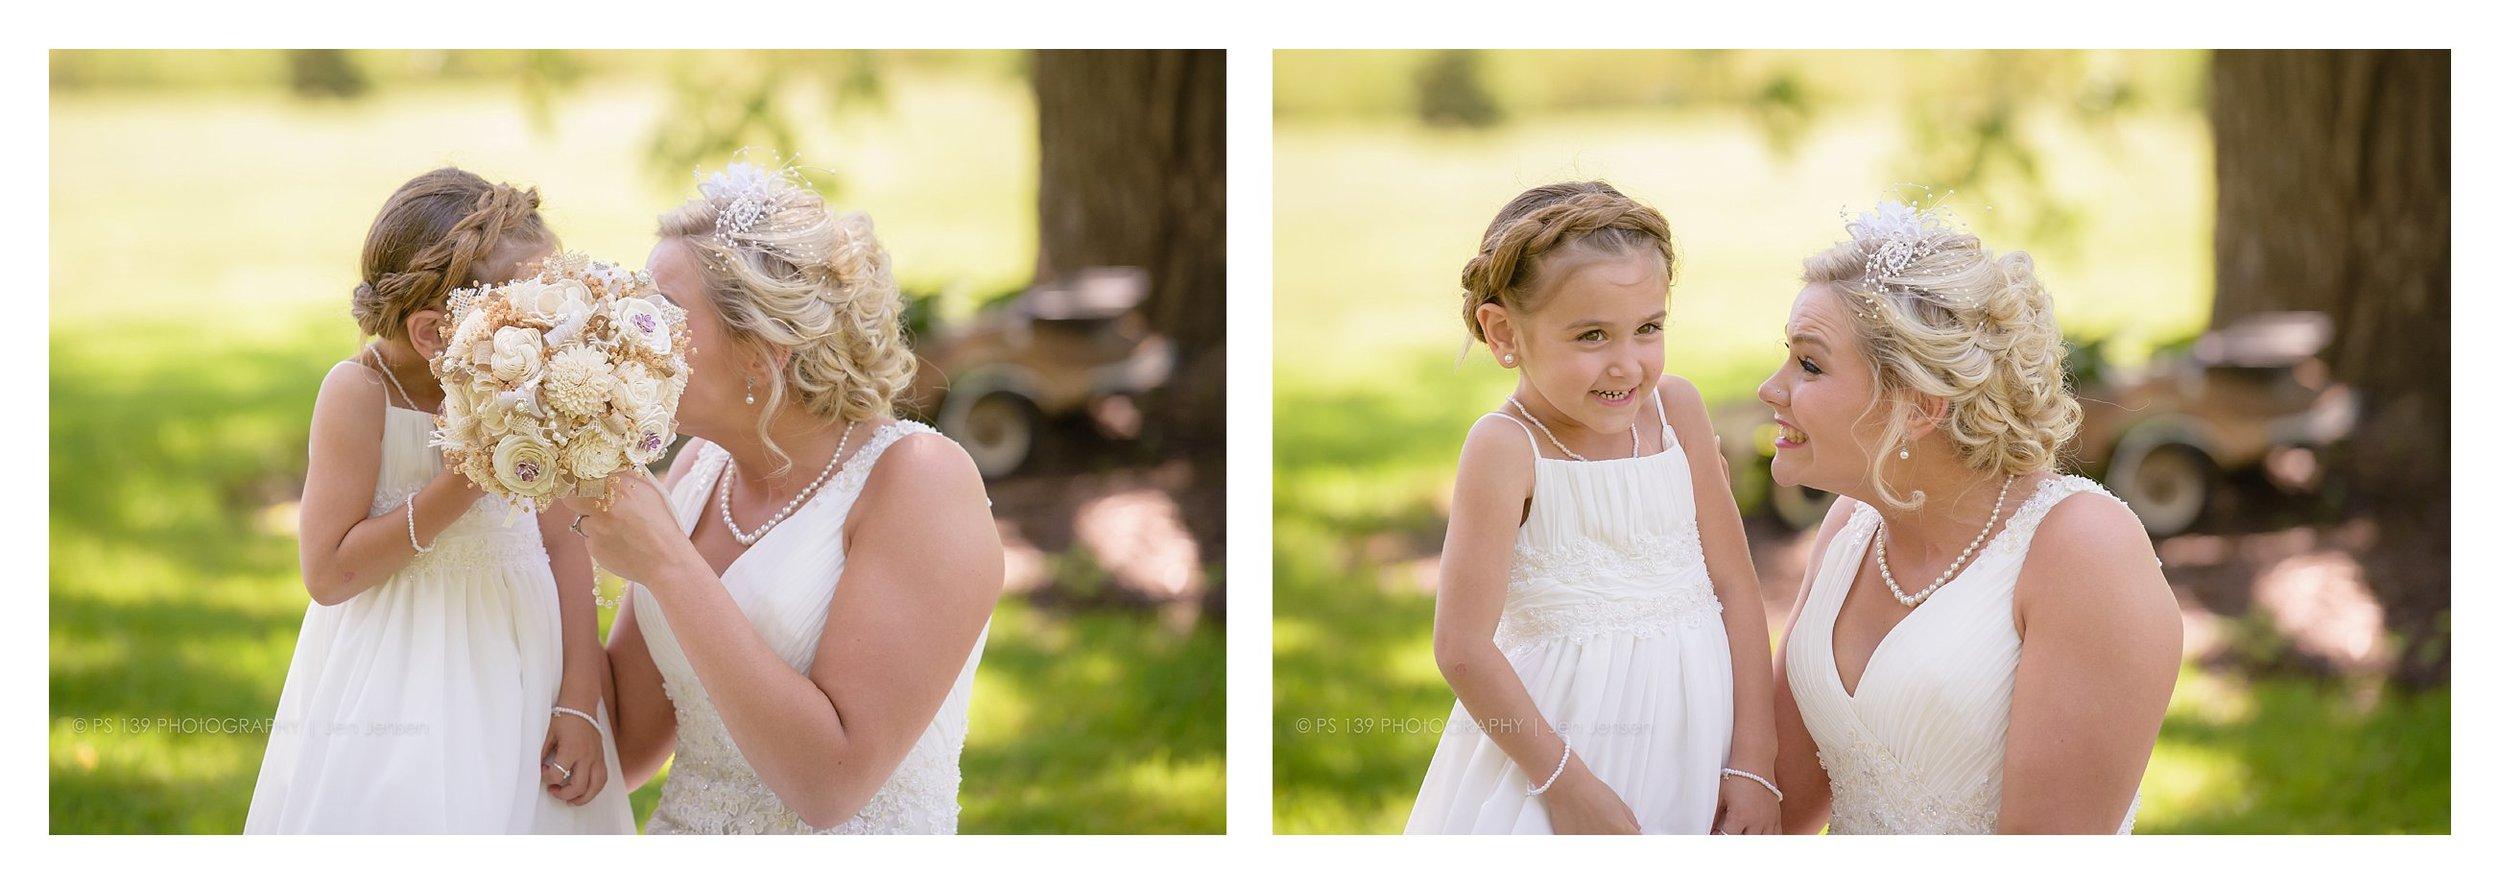 oregon Illinois oak lane farm wisconsin wedding photographer bayfield wi ps 139 photography jen jensen_0263.jpg